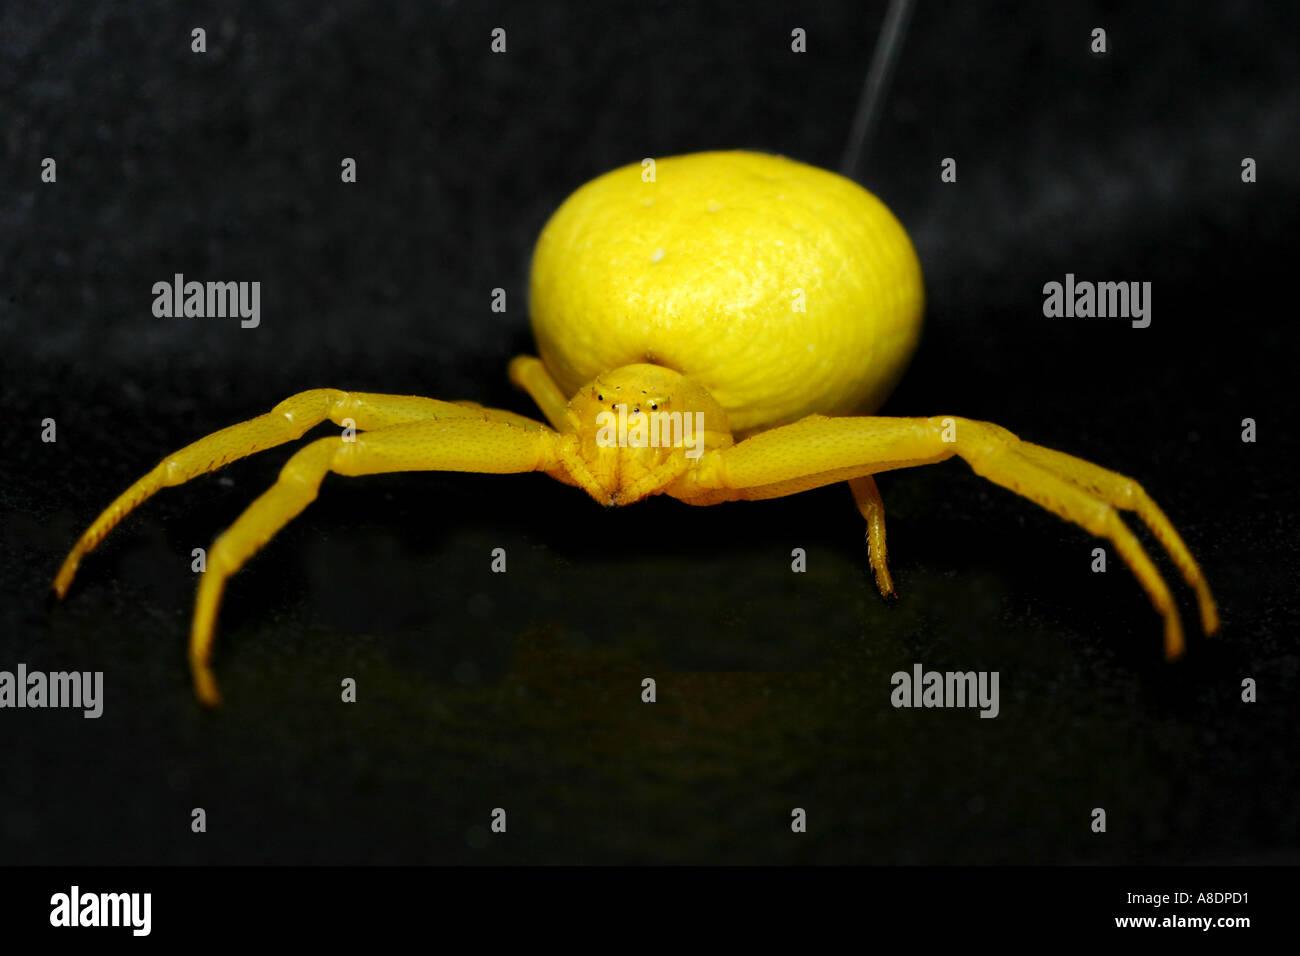 Yellow Goldenrod crab spider, Misumena vatia Stock Photo